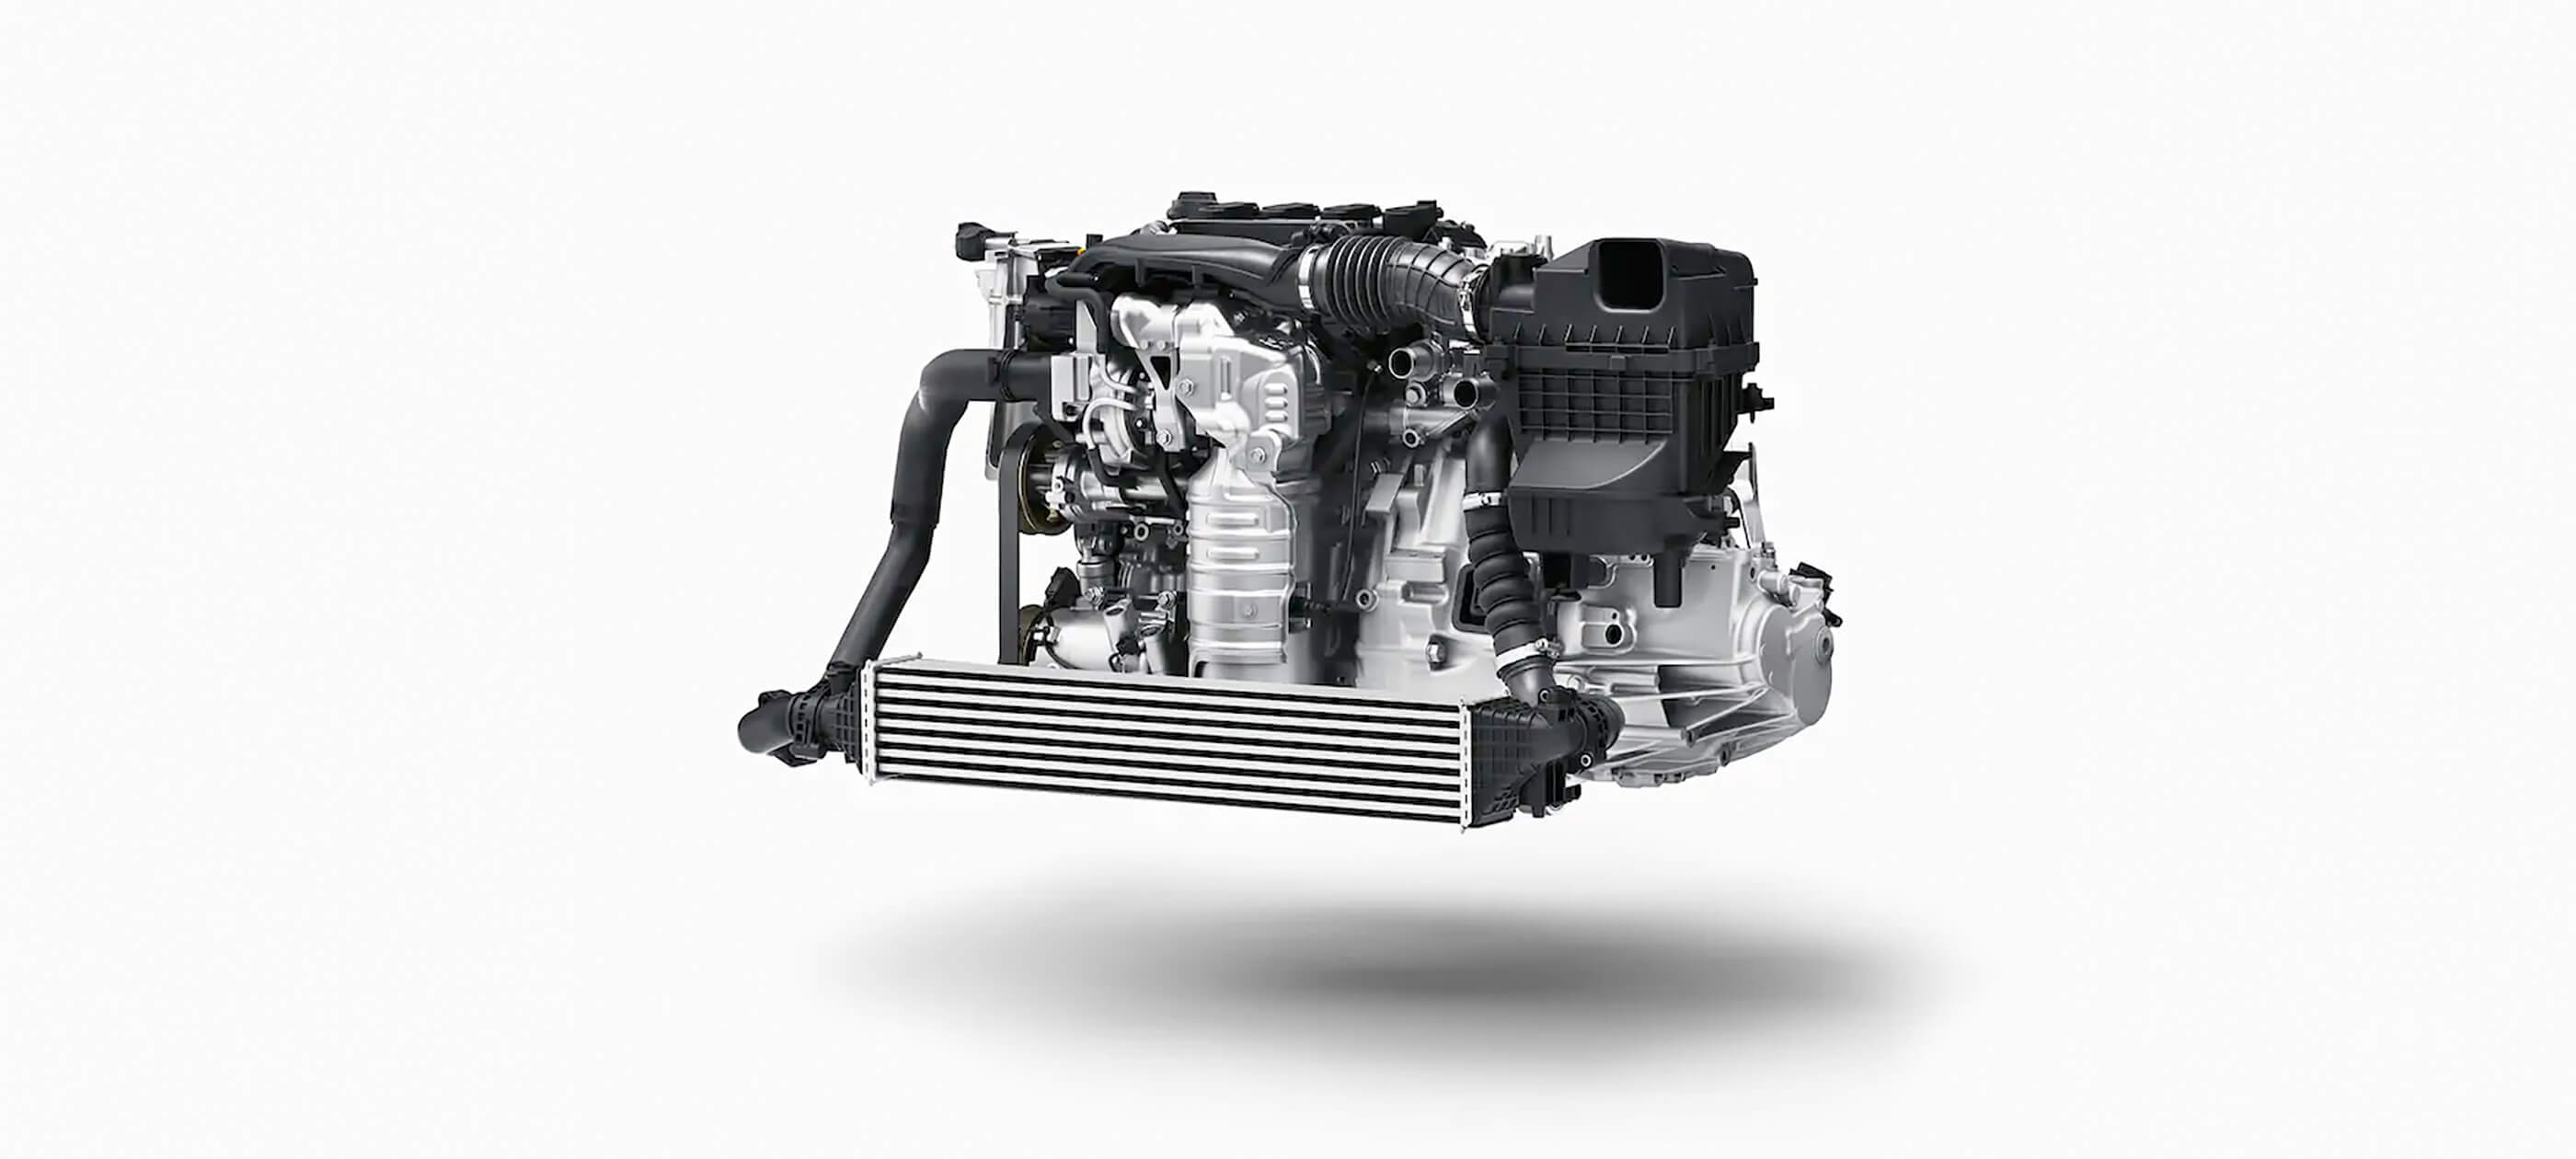 Motor Turboalimentado